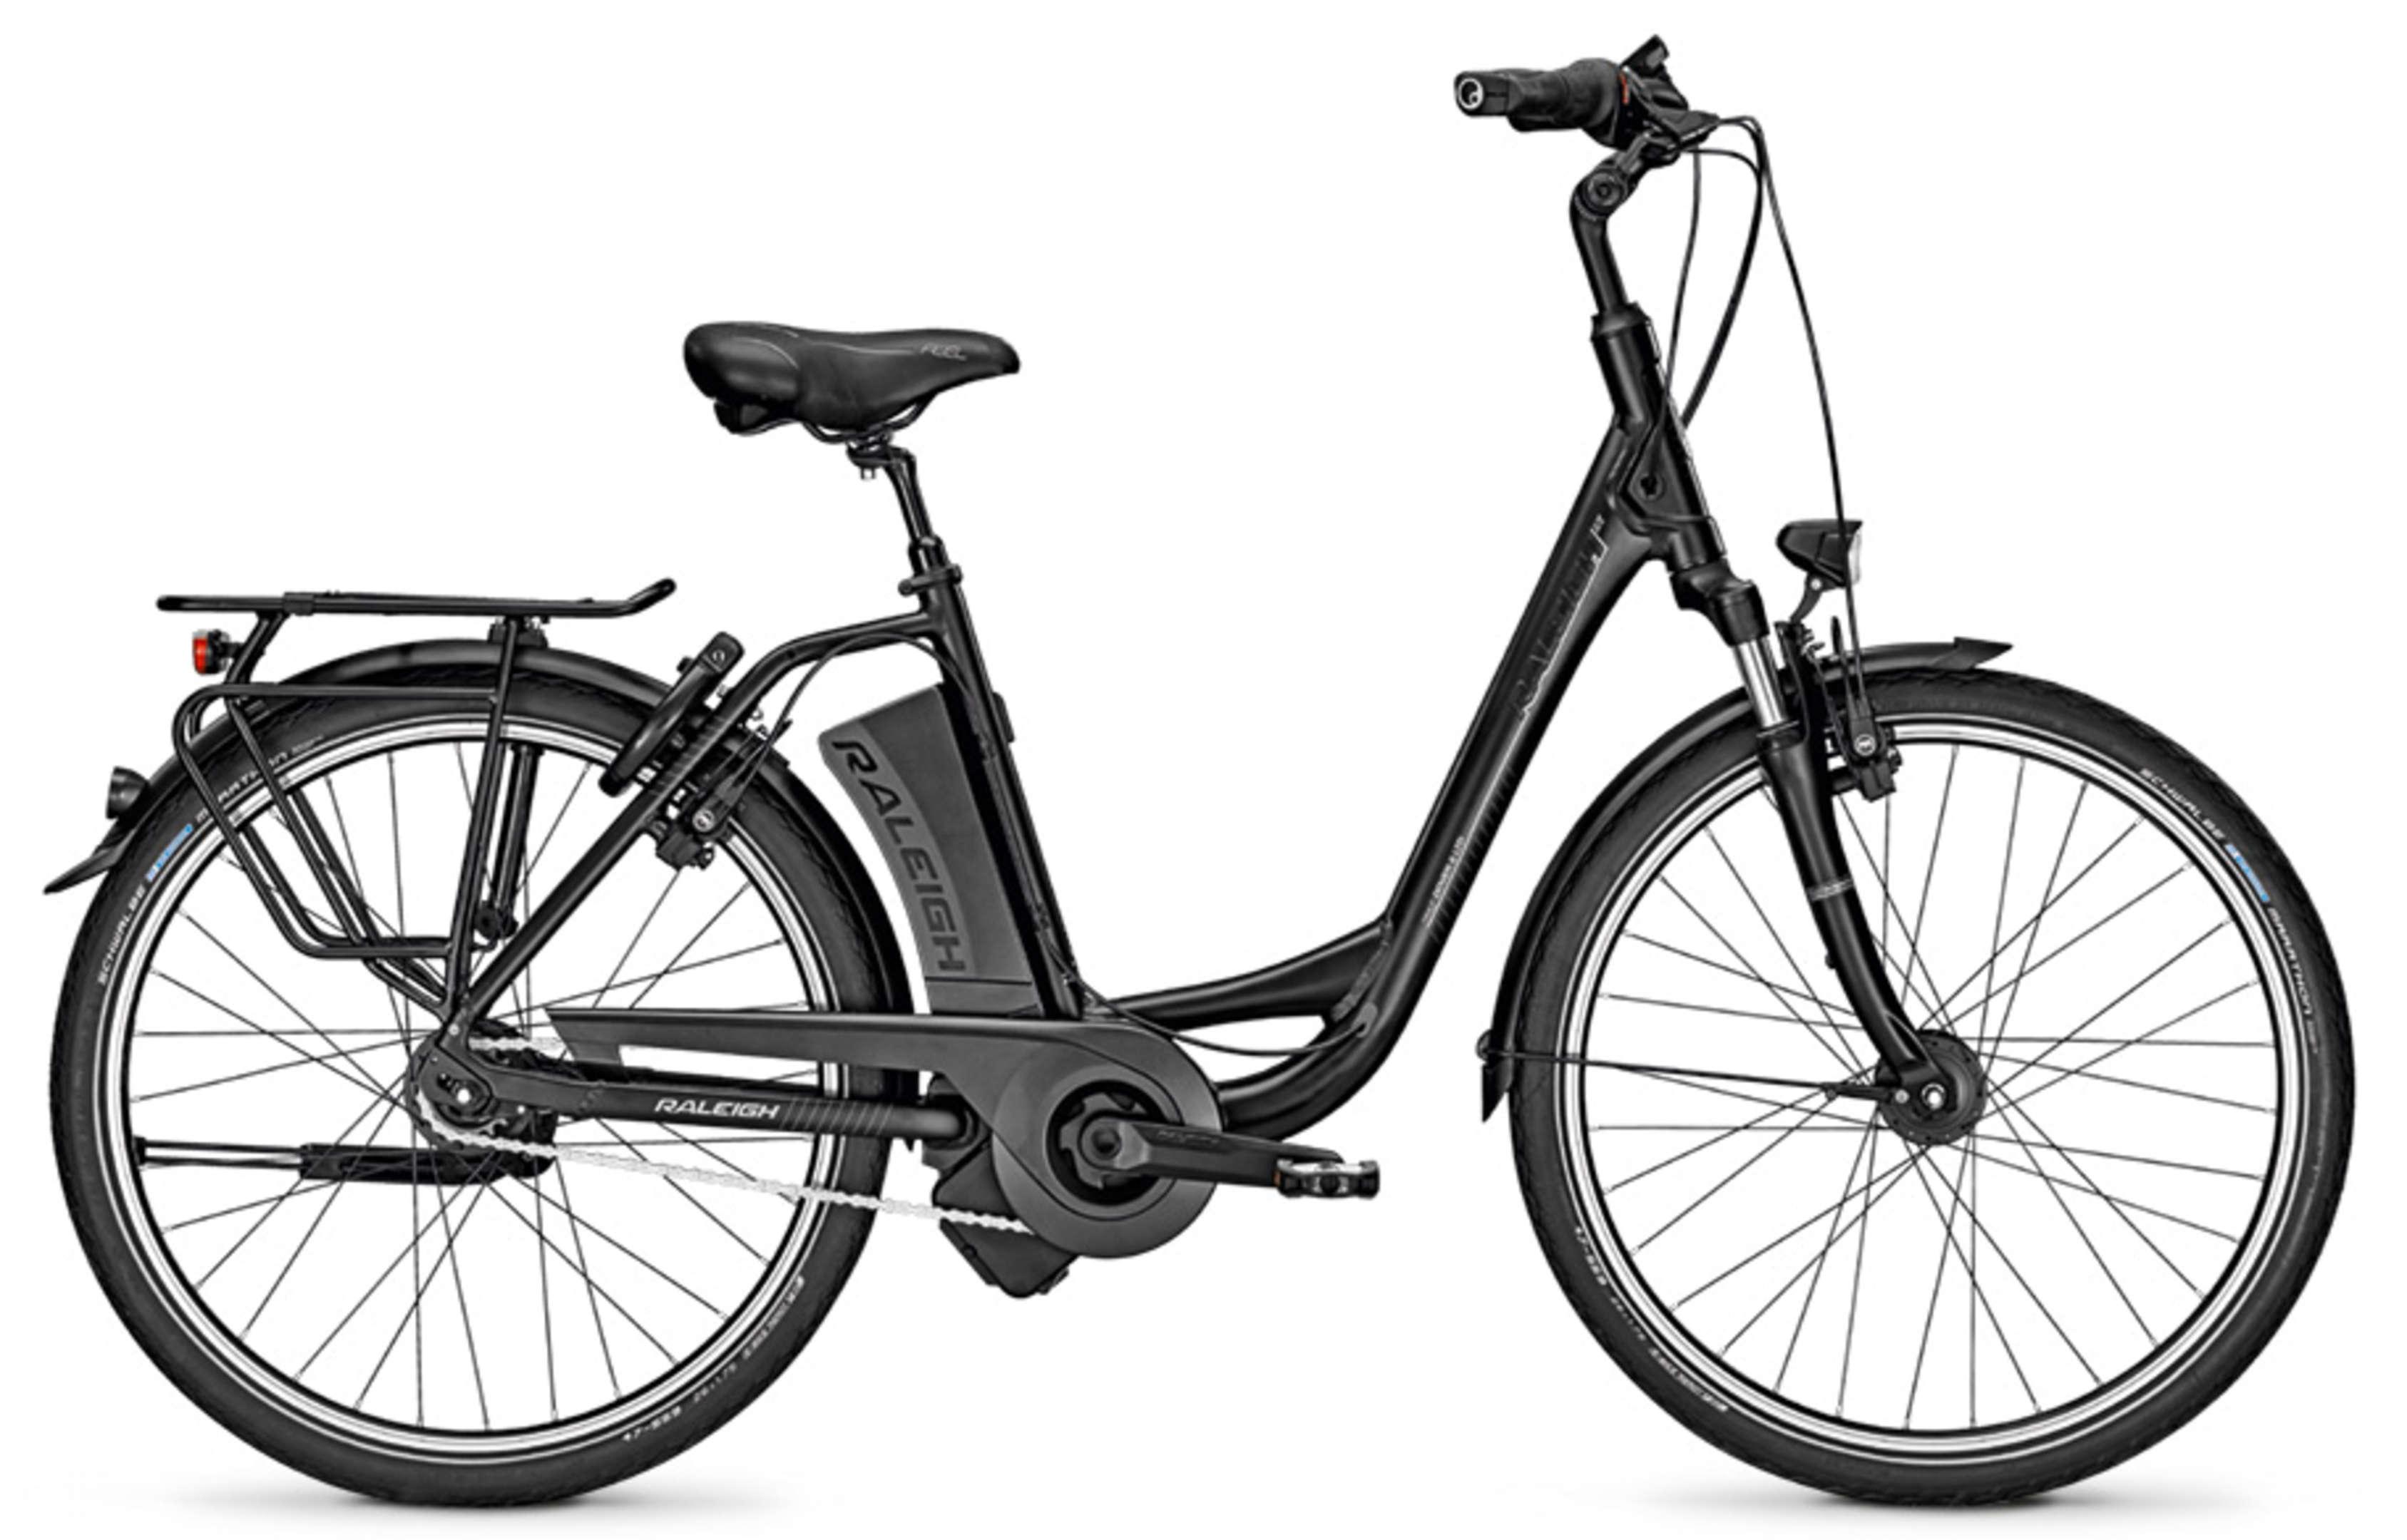 raleigh e bike dover impulse 8 hs eurorad. Black Bedroom Furniture Sets. Home Design Ideas